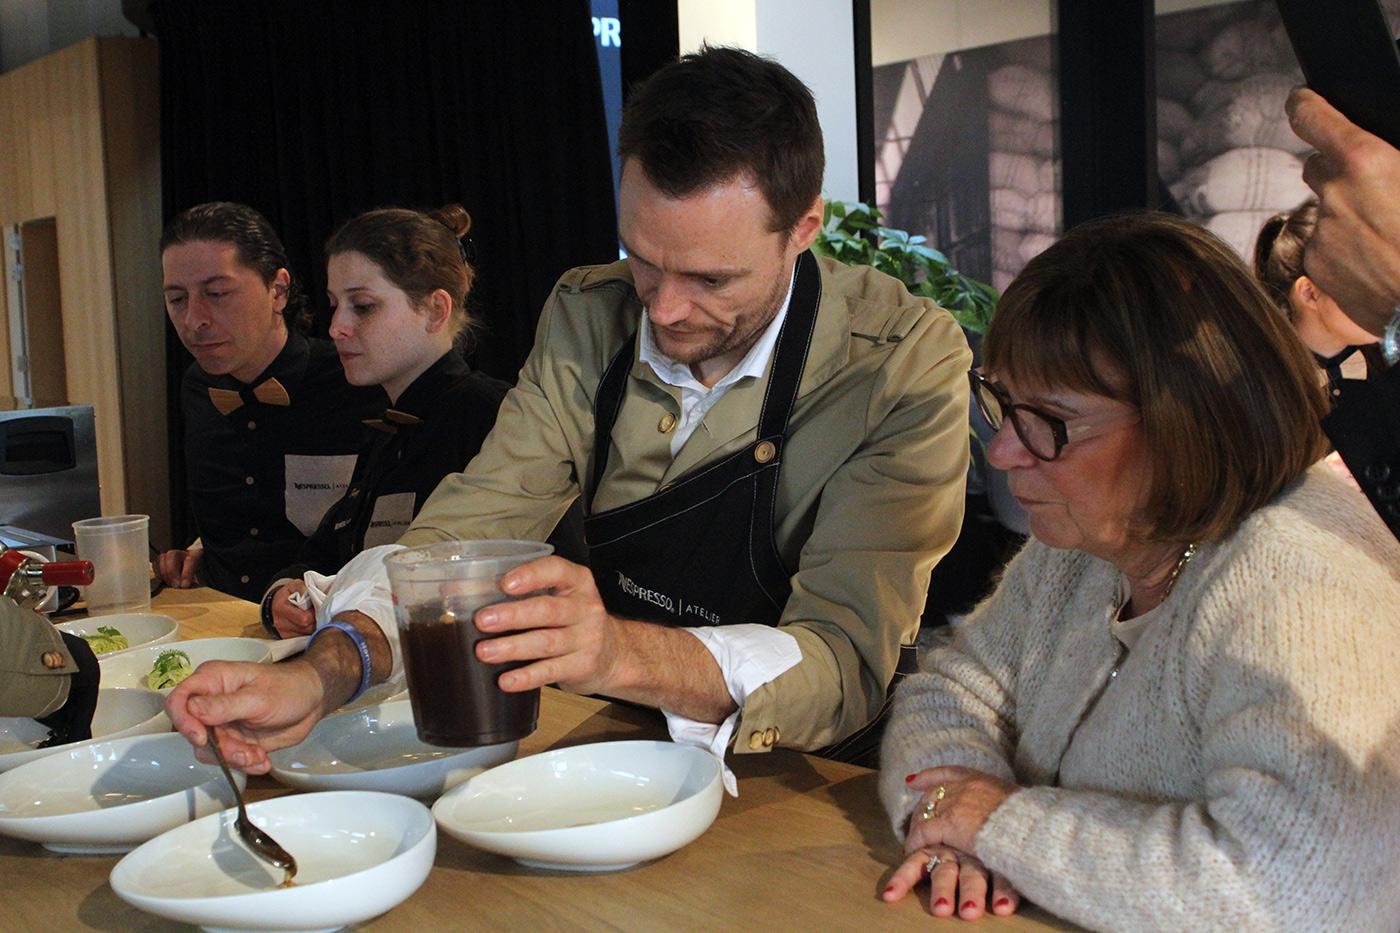 Atelier Nespresso Filip Claeys